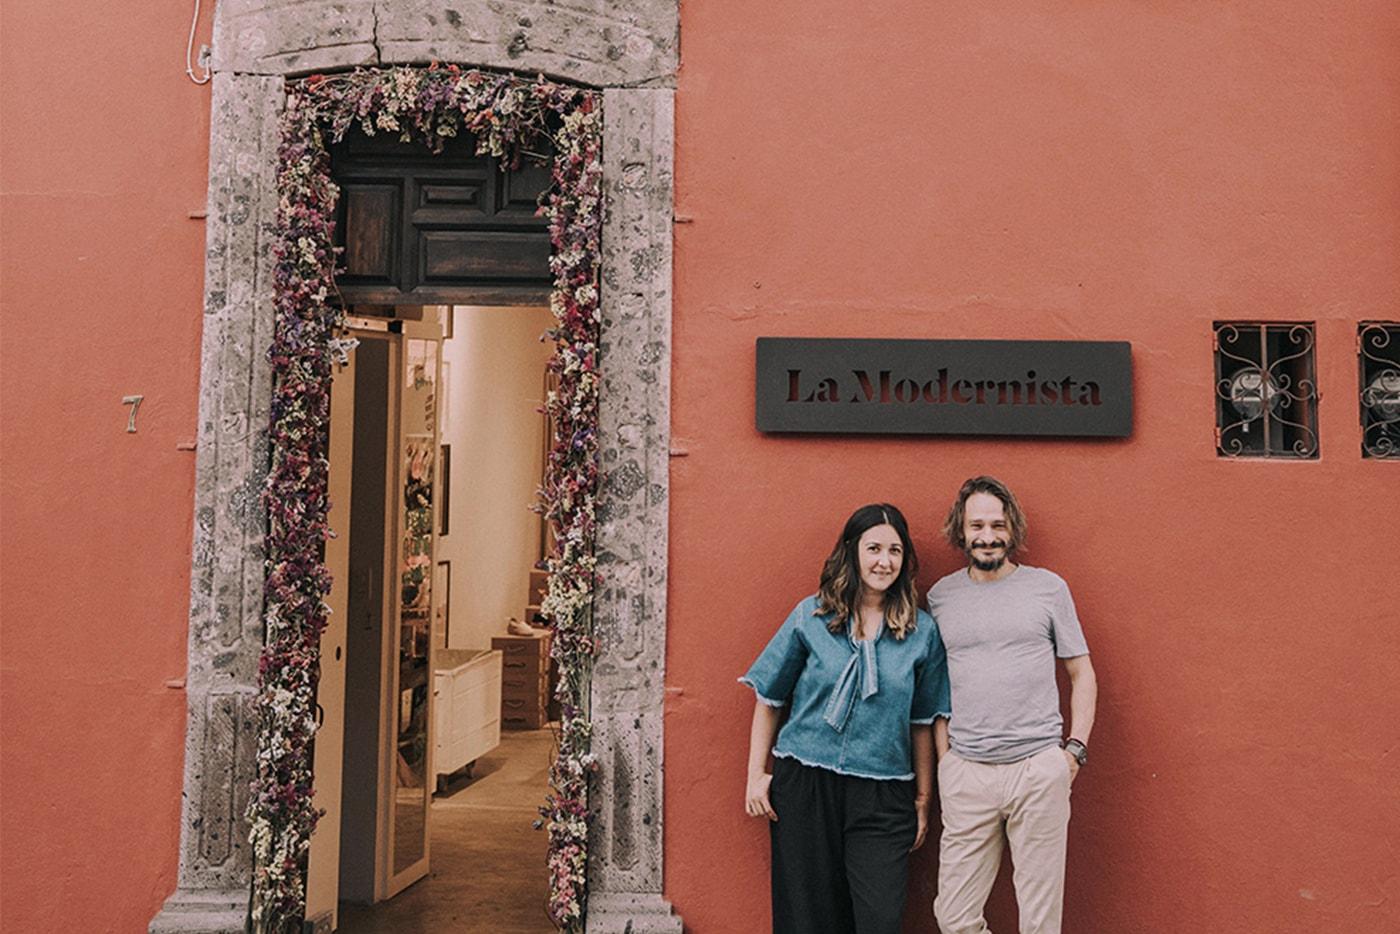 LaModernista-tinda-San-Miguel-de-Allende-Ana-David-1